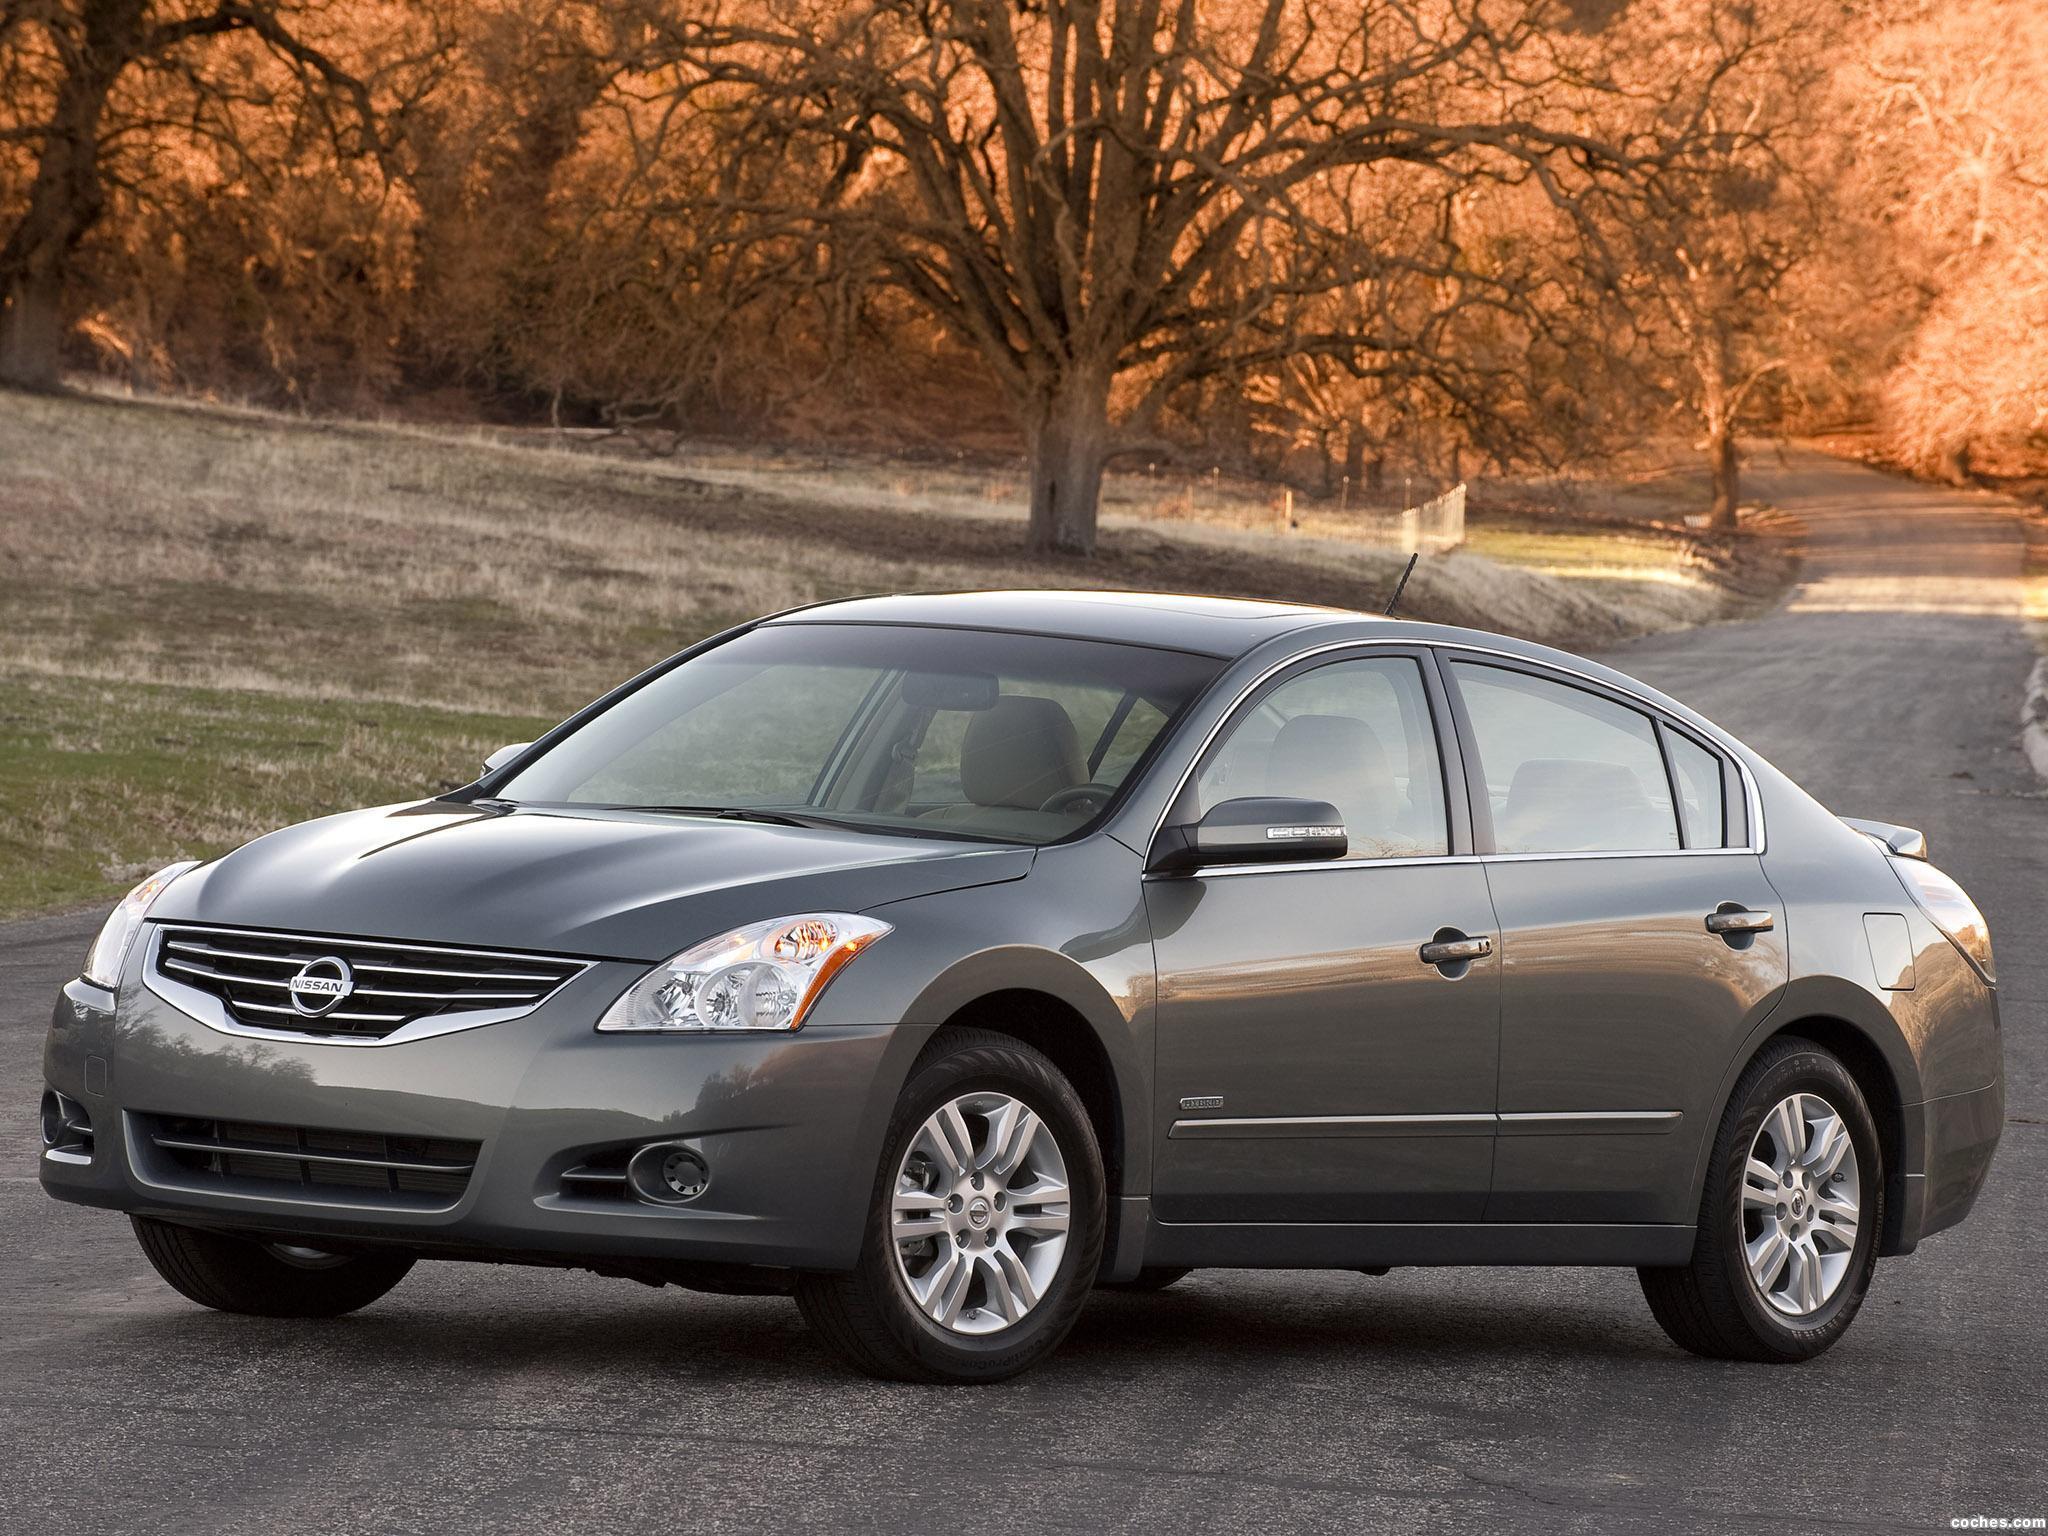 Foto 0 de Nissan Altima Hybrid 2010